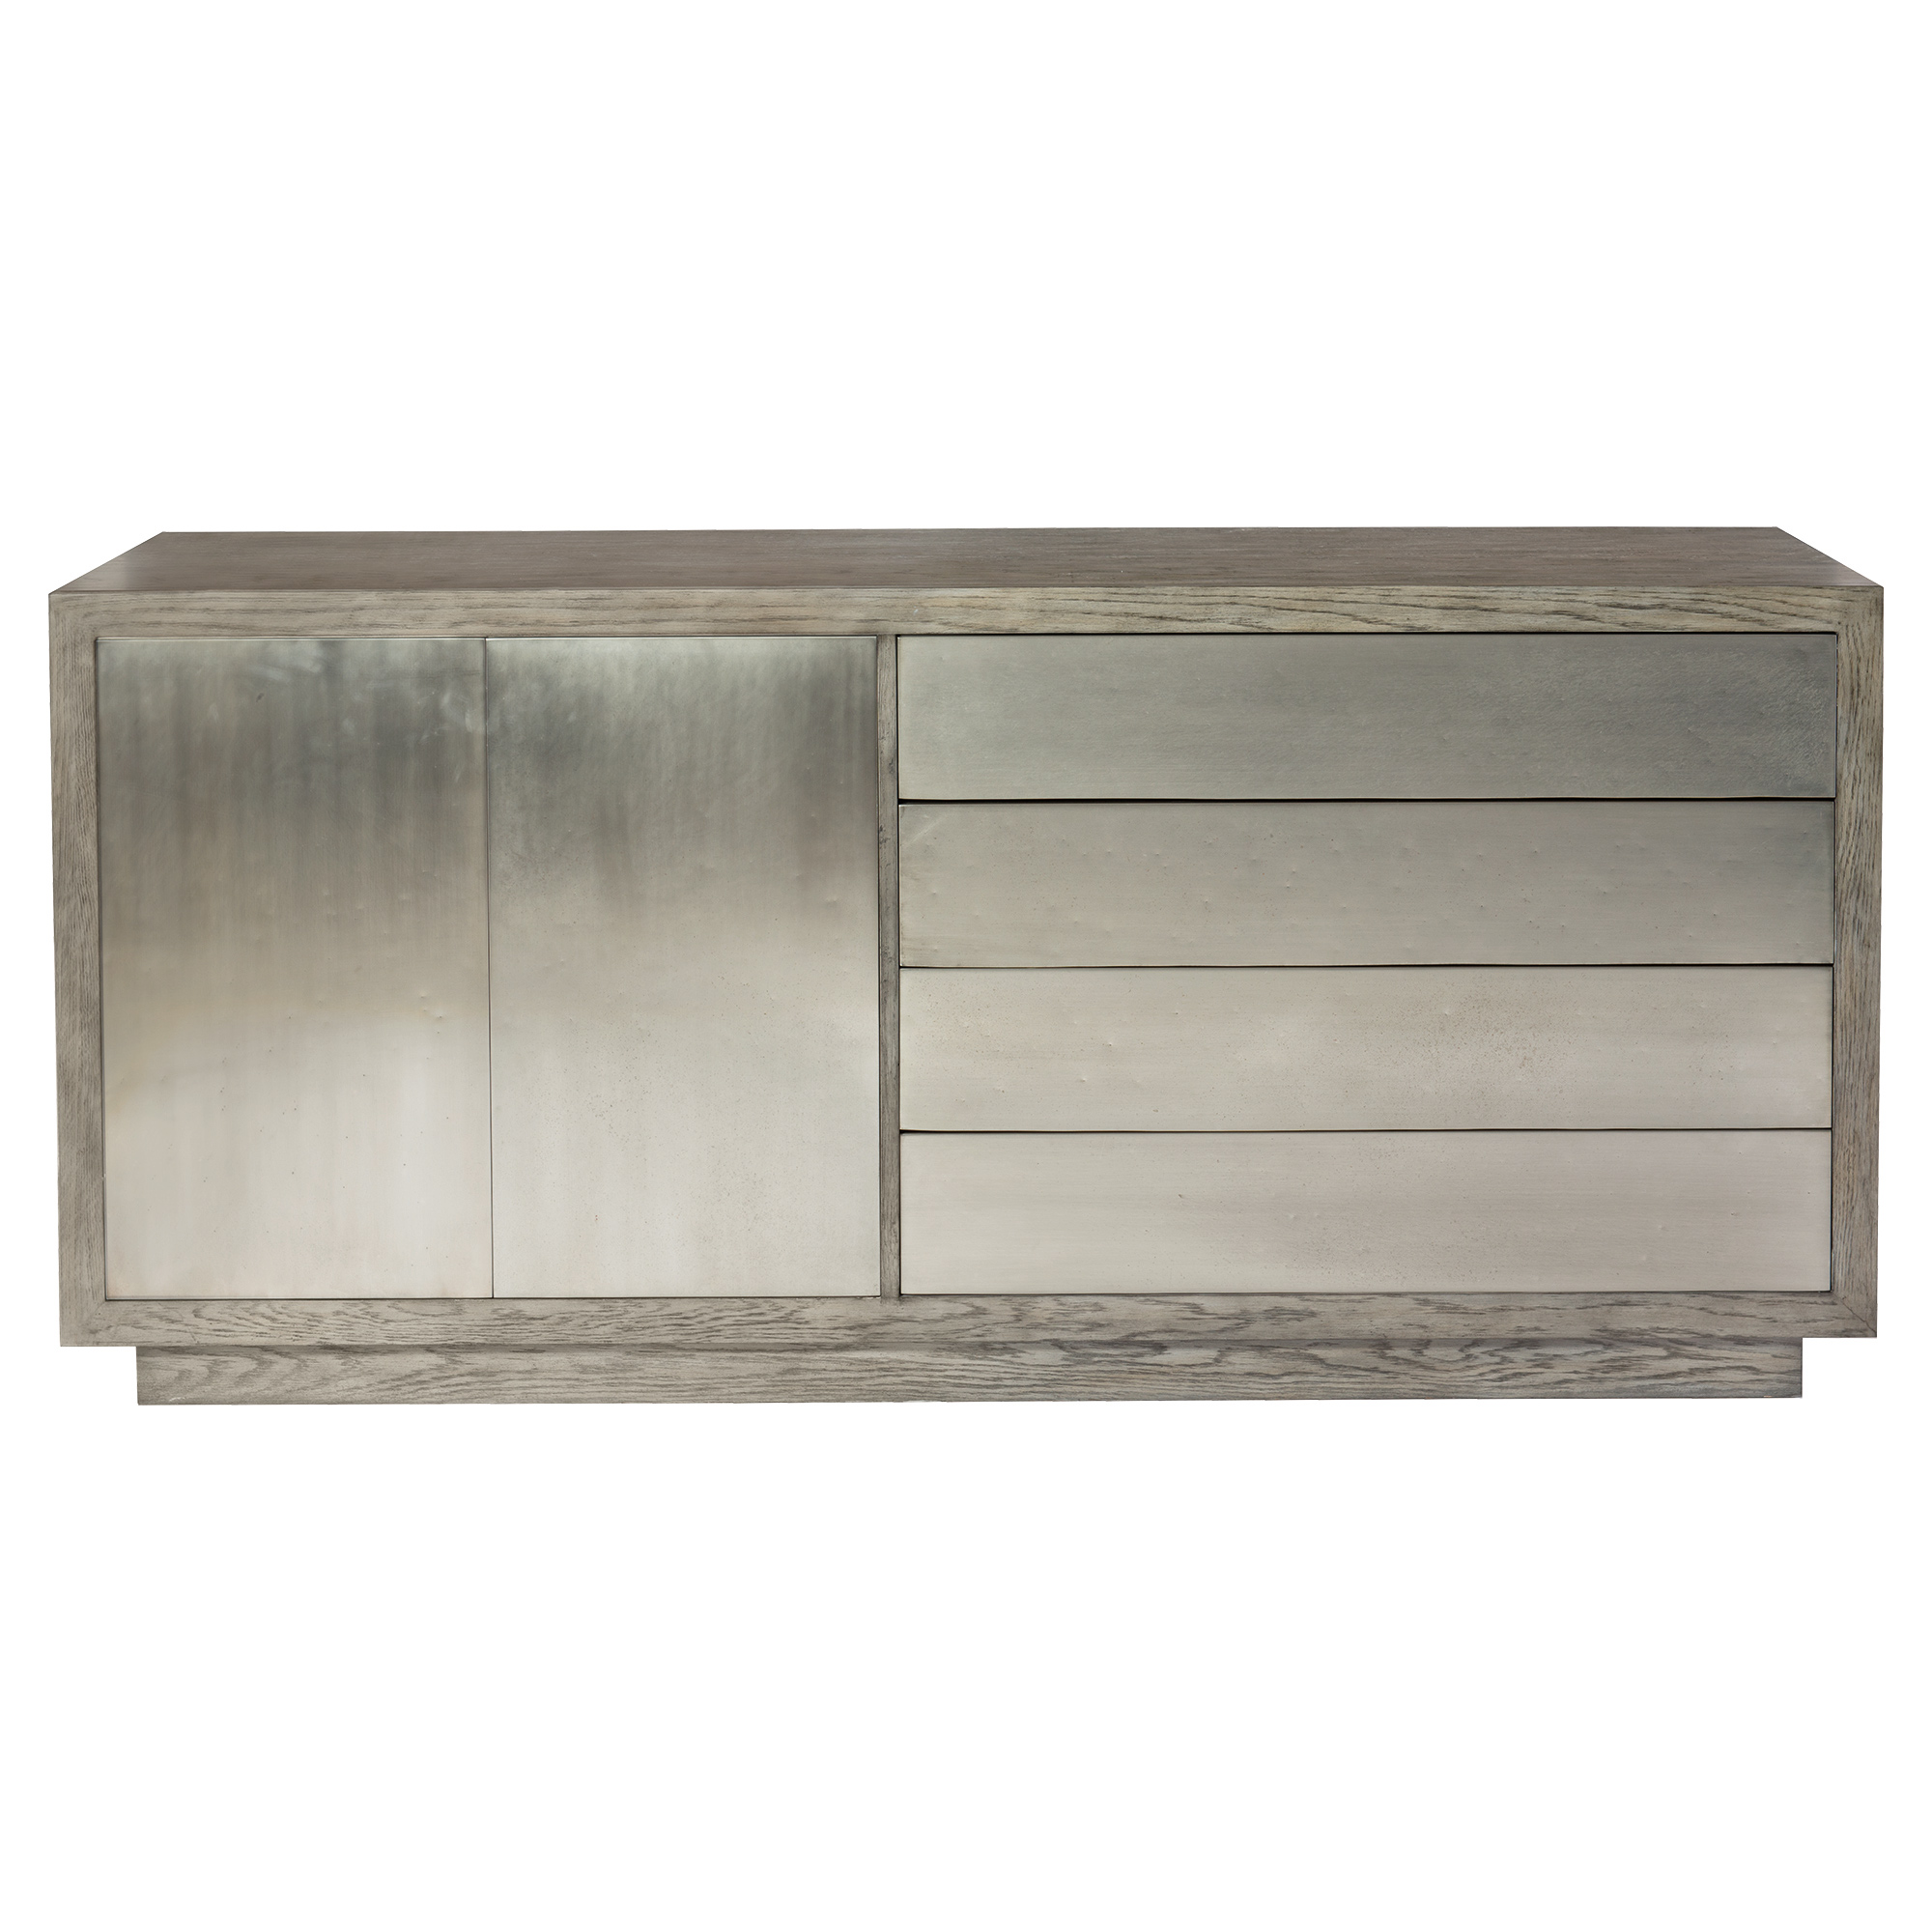 Benitez Modern Rustic Grey Wood Tarnished Nickel Buffet